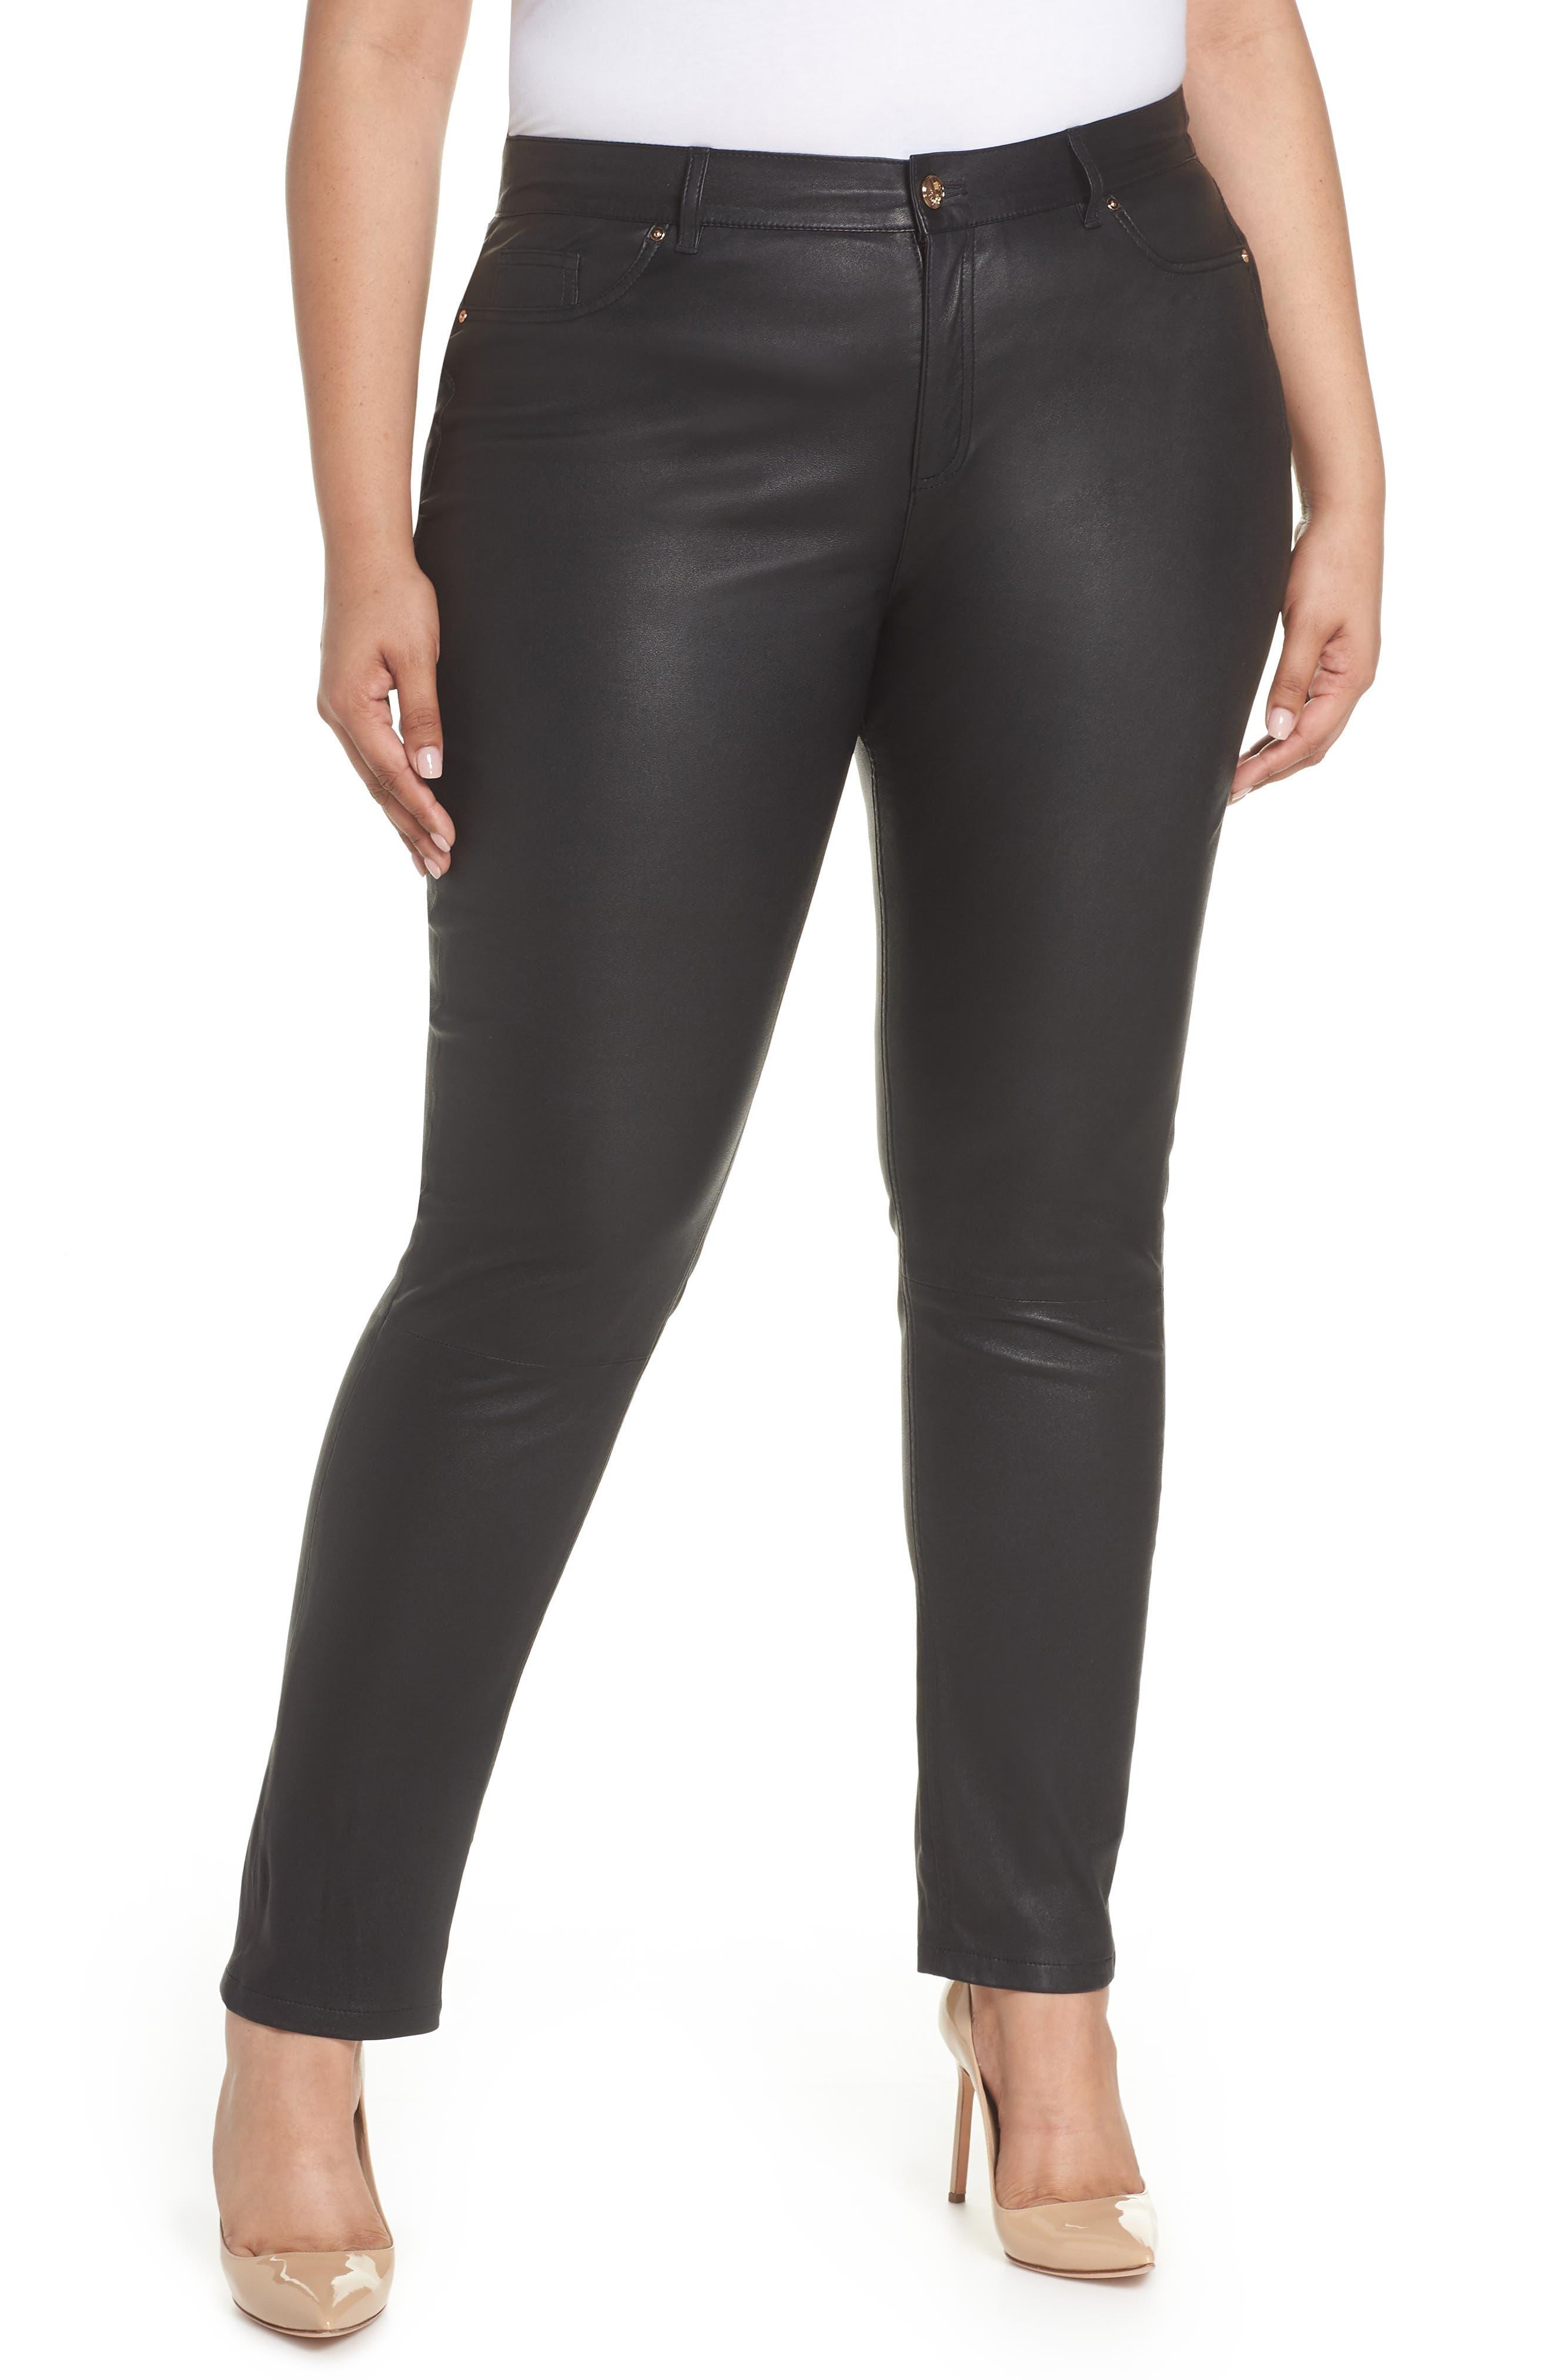 Eboli Leather Pants,                             Main thumbnail 1, color,                             001